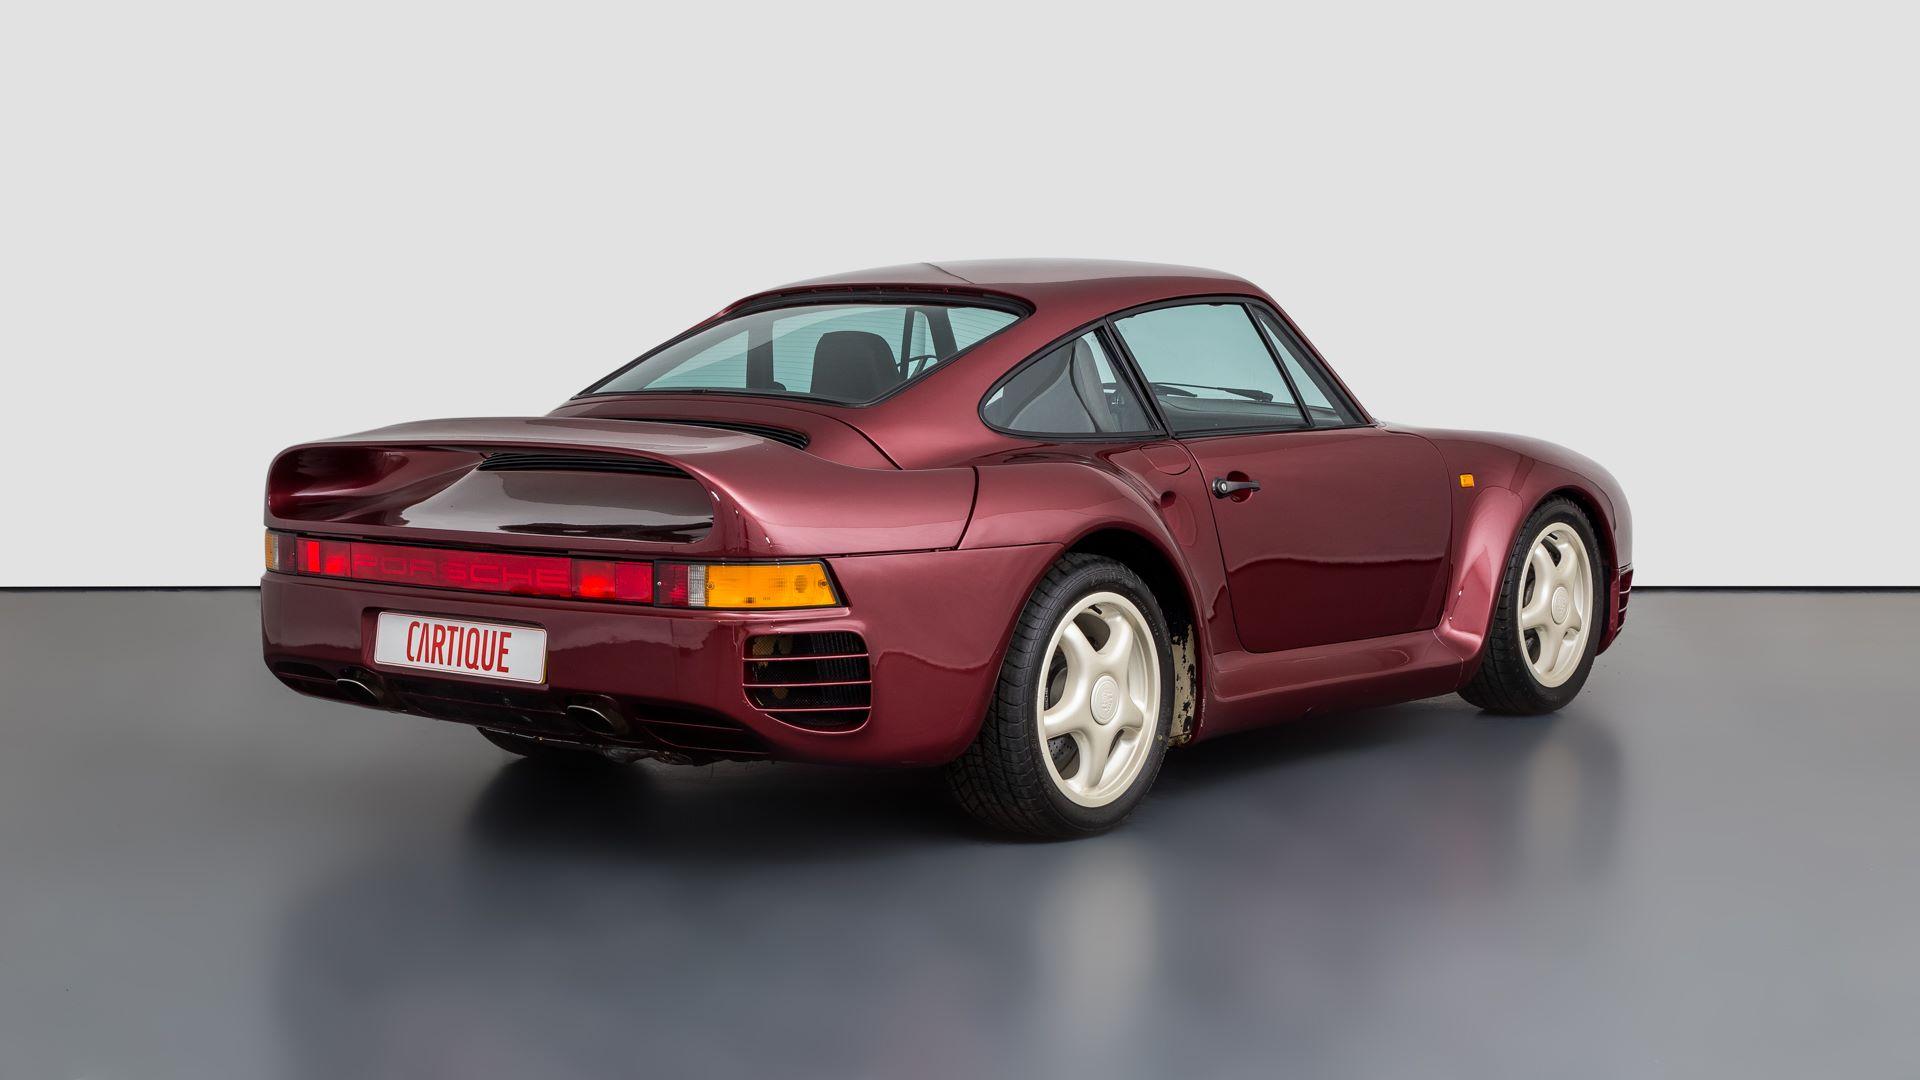 Porsche-959-Prototype-1985-for-sale-8